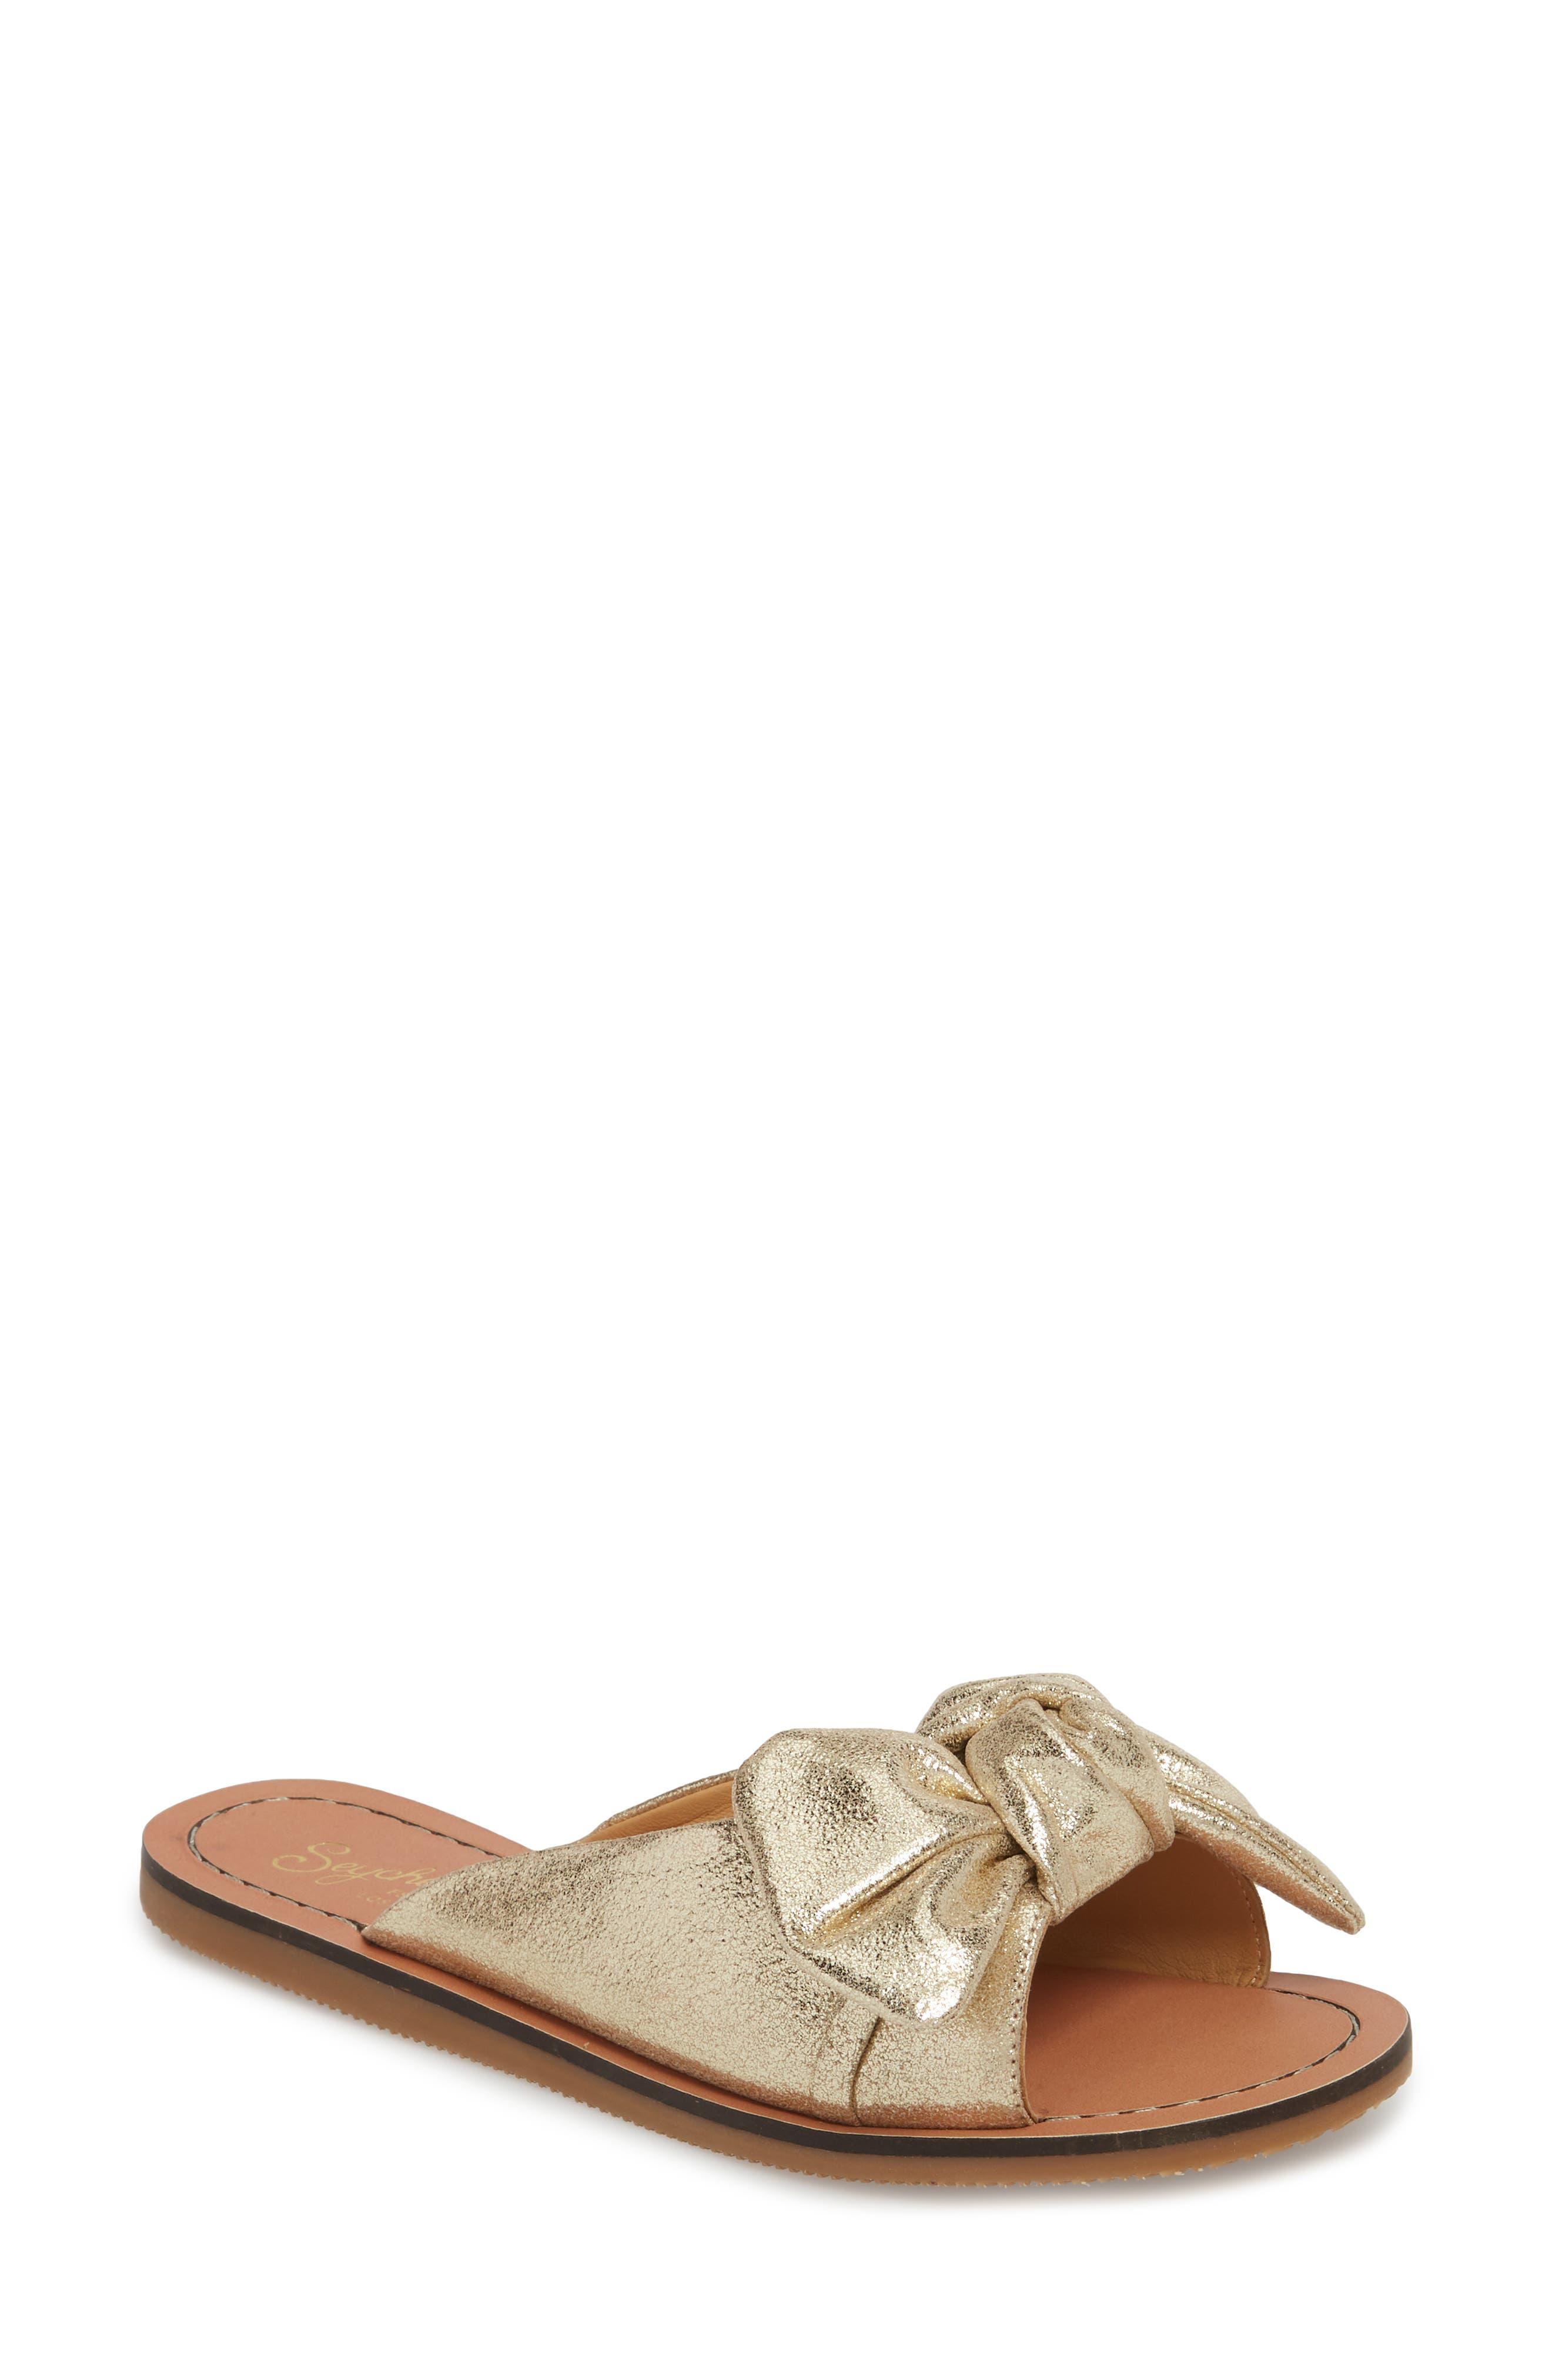 Childlike Enthusiam Slide Sandal,                         Main,                         color, Gold Leather